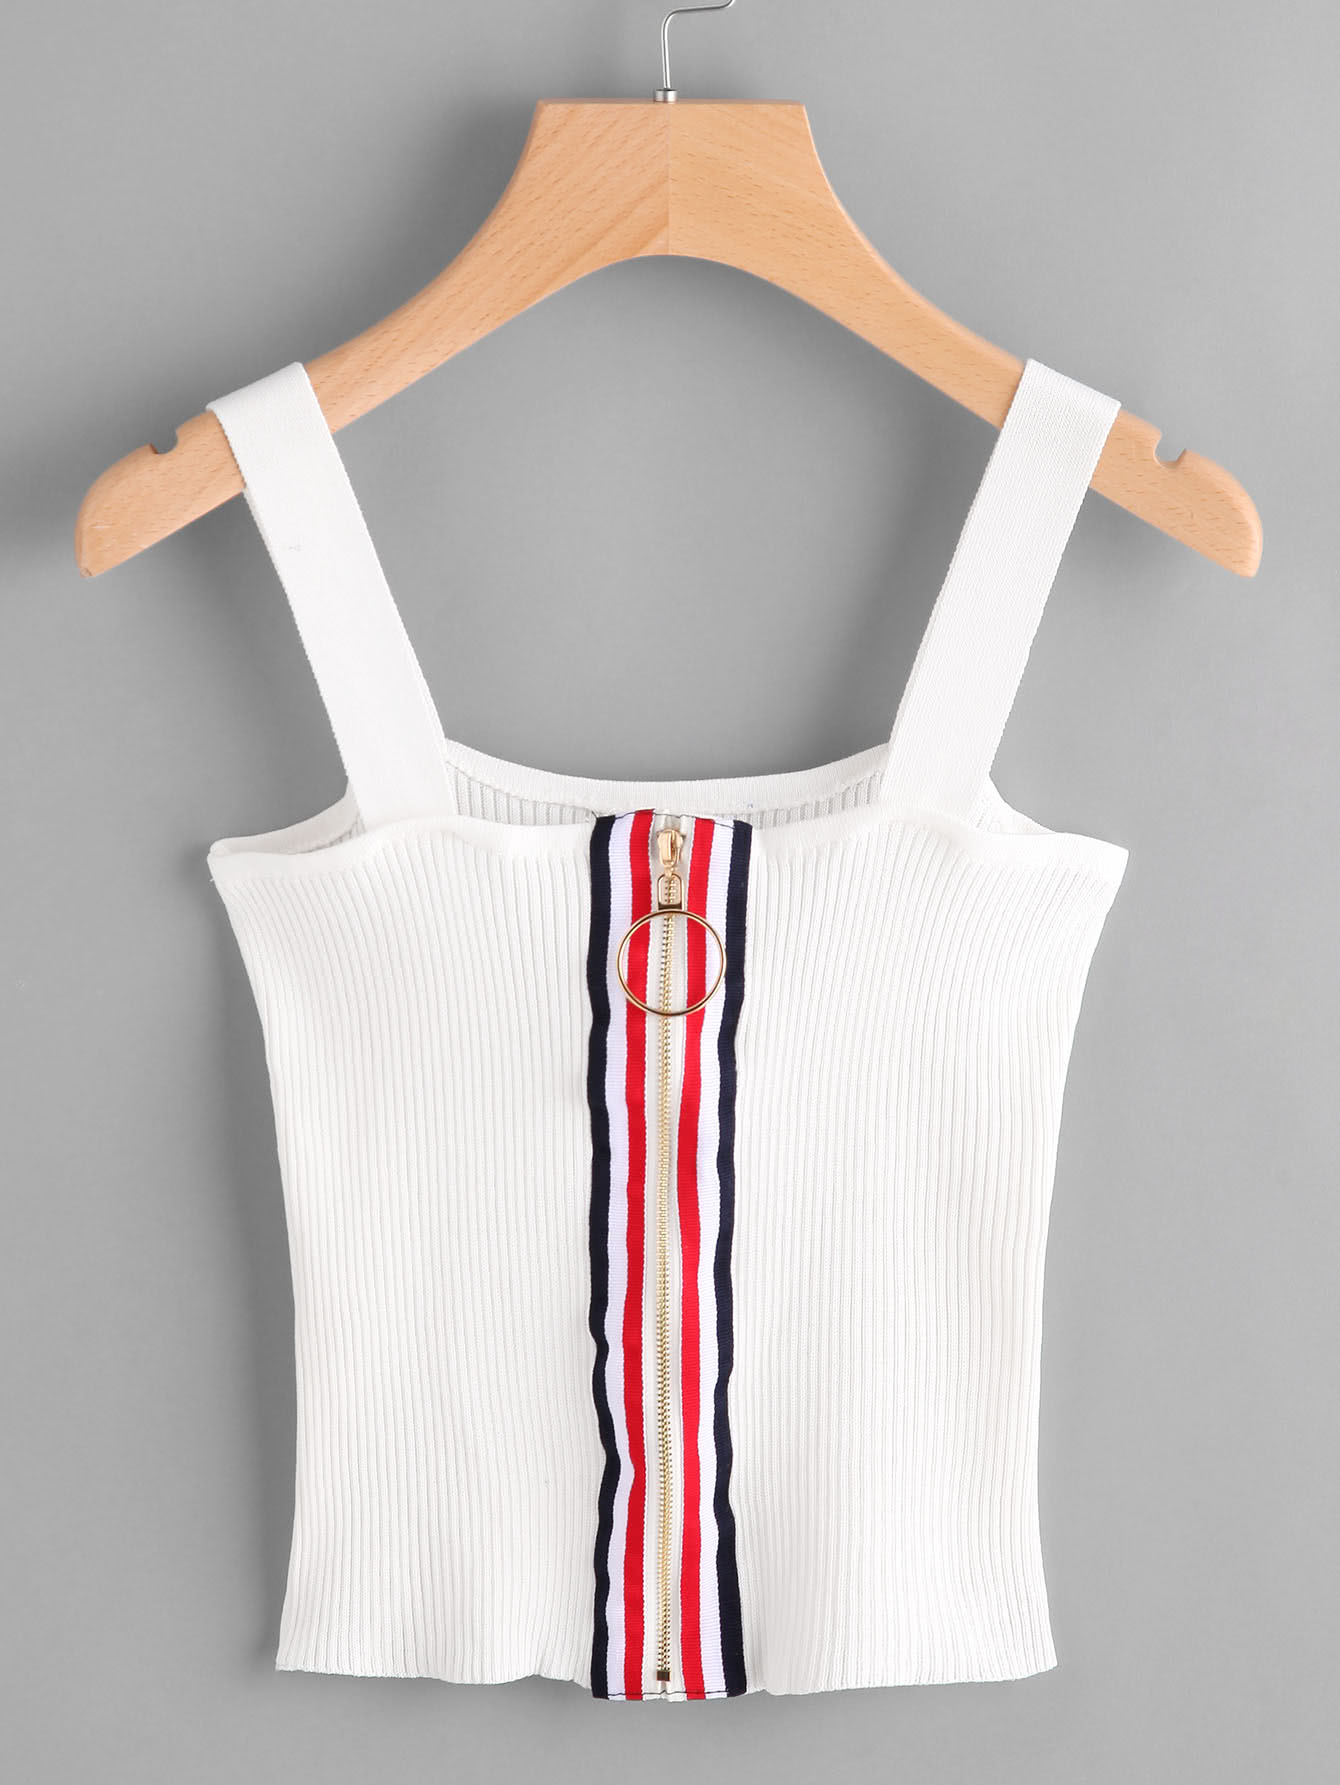 Contrast Stripe Ring Zip Up Ribbed Cami Top ribbed zip up jacquard cardigan